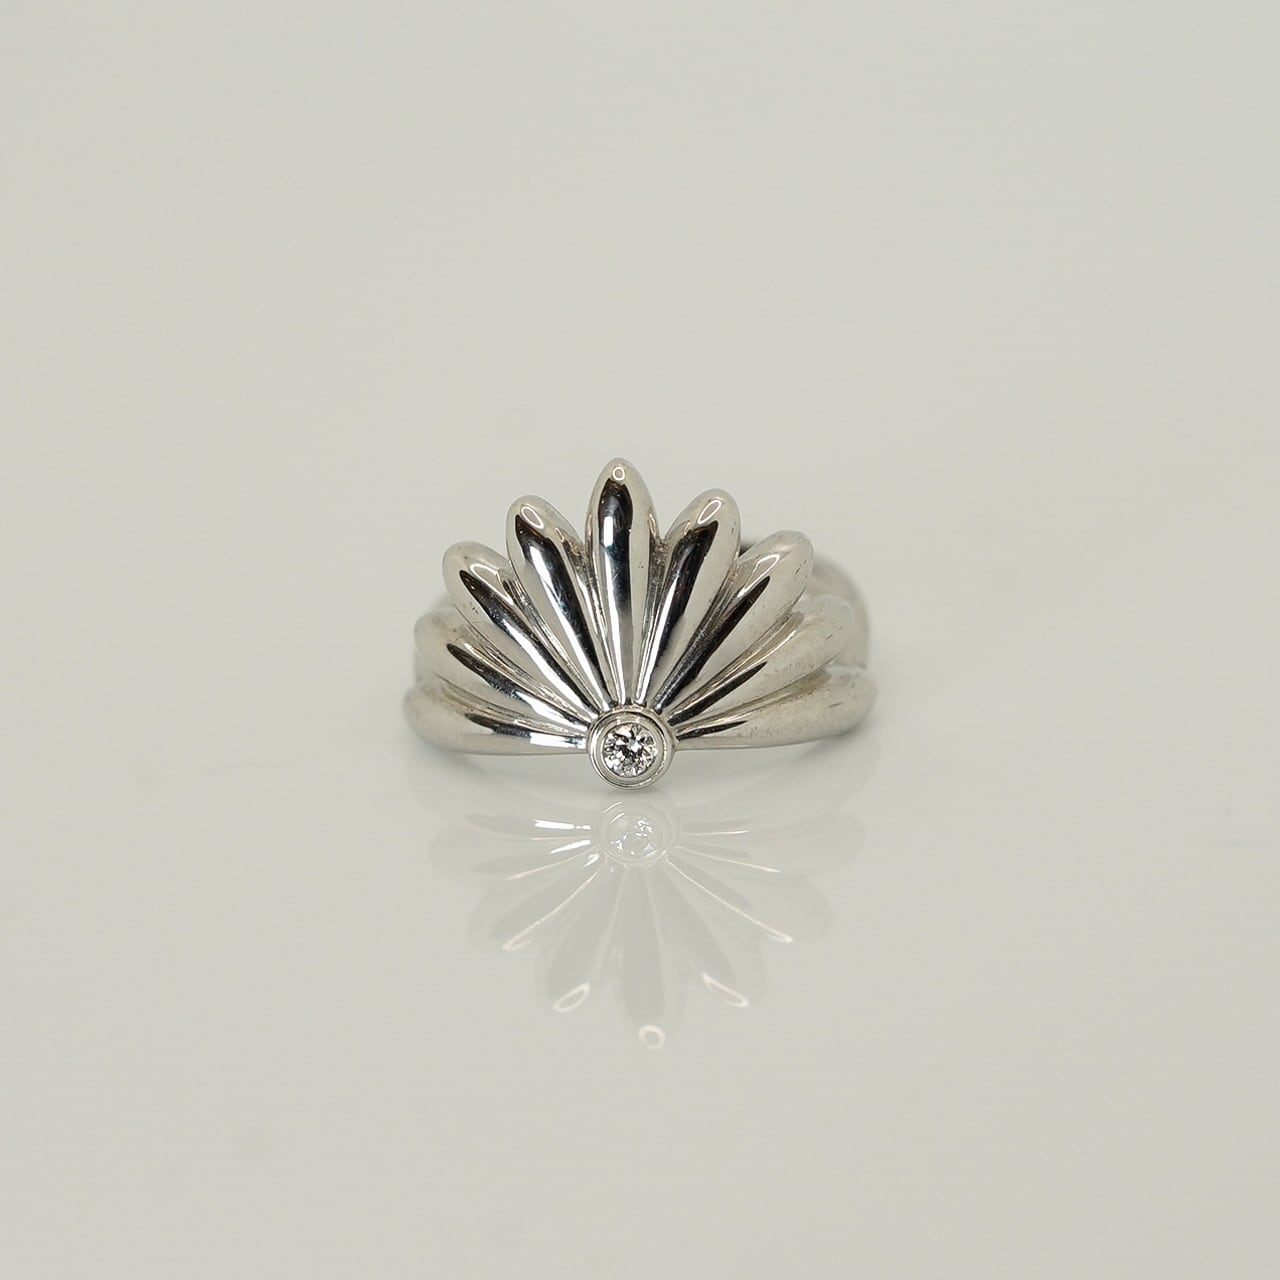 Chrysanthemum ring - SV